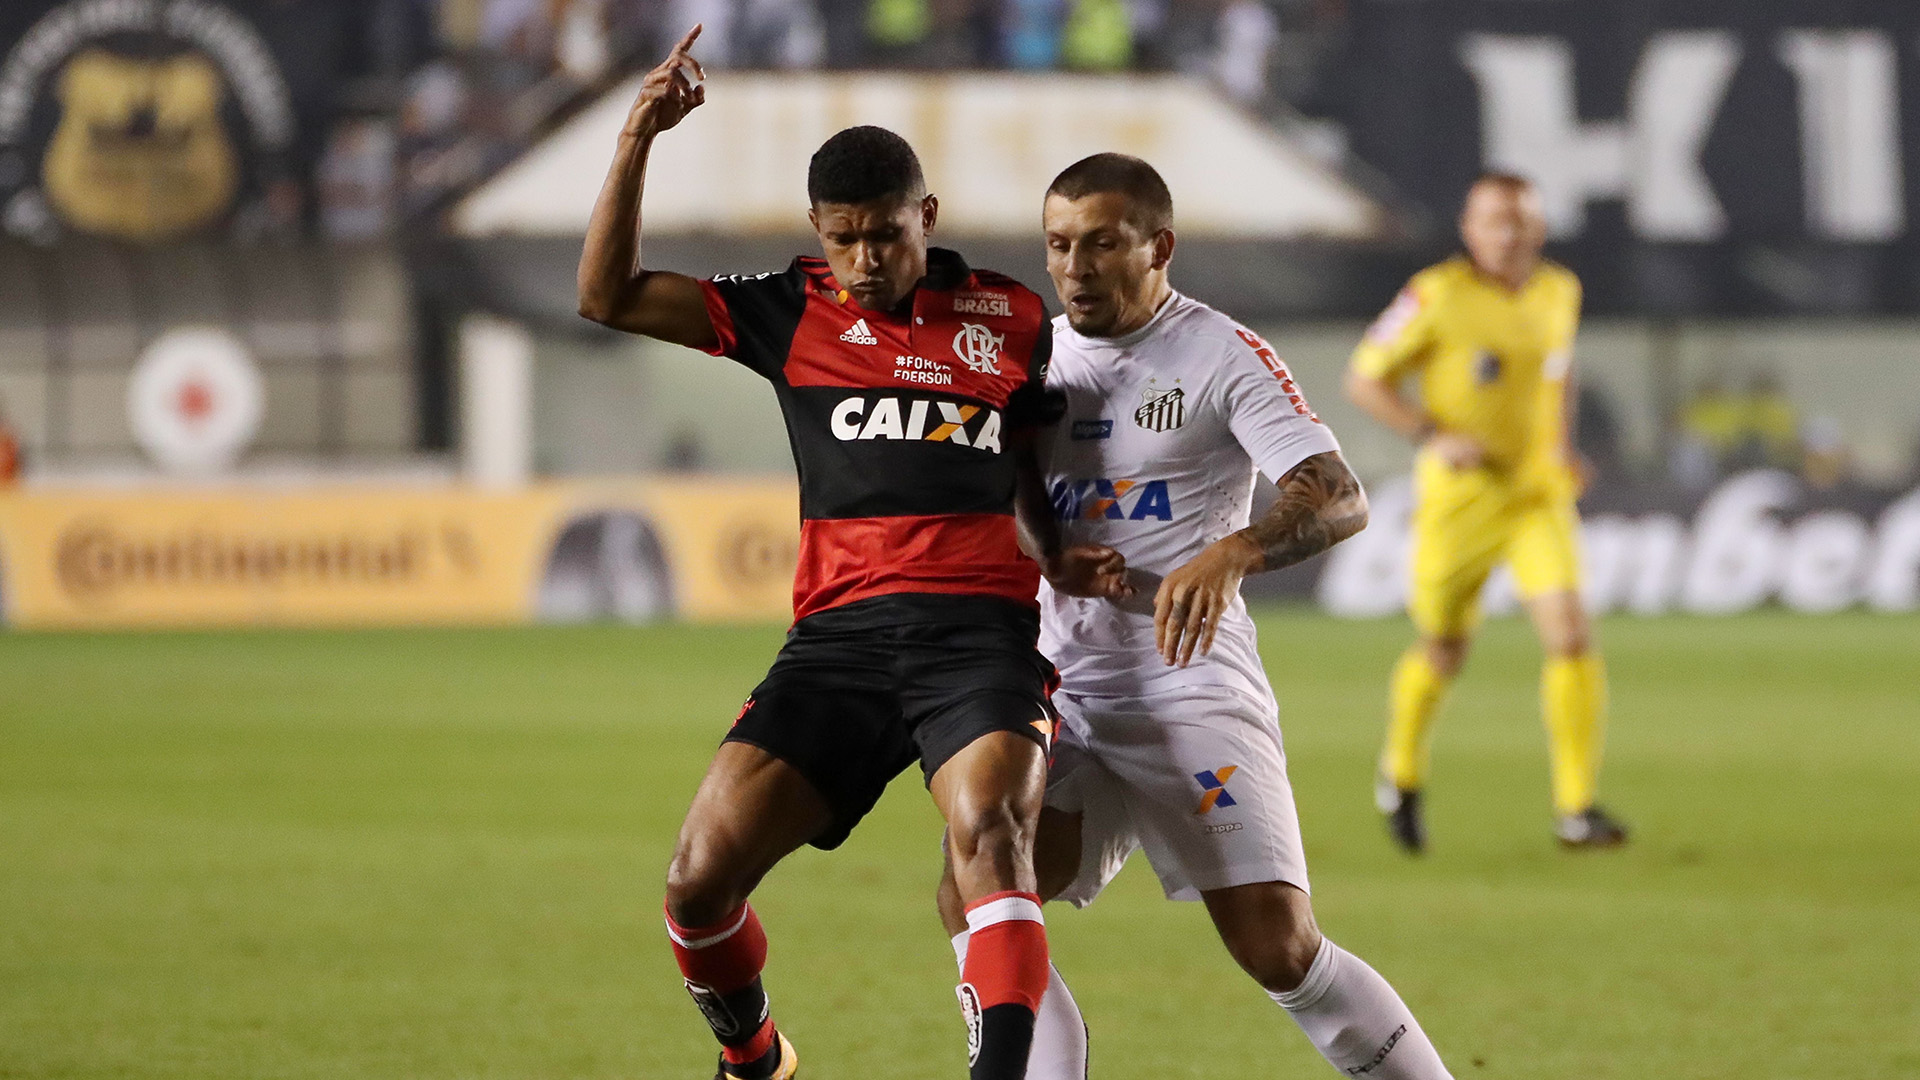 Marcio Araujo Emiliano Vecchio Santos Flamengo Copa do Brasil 26072017